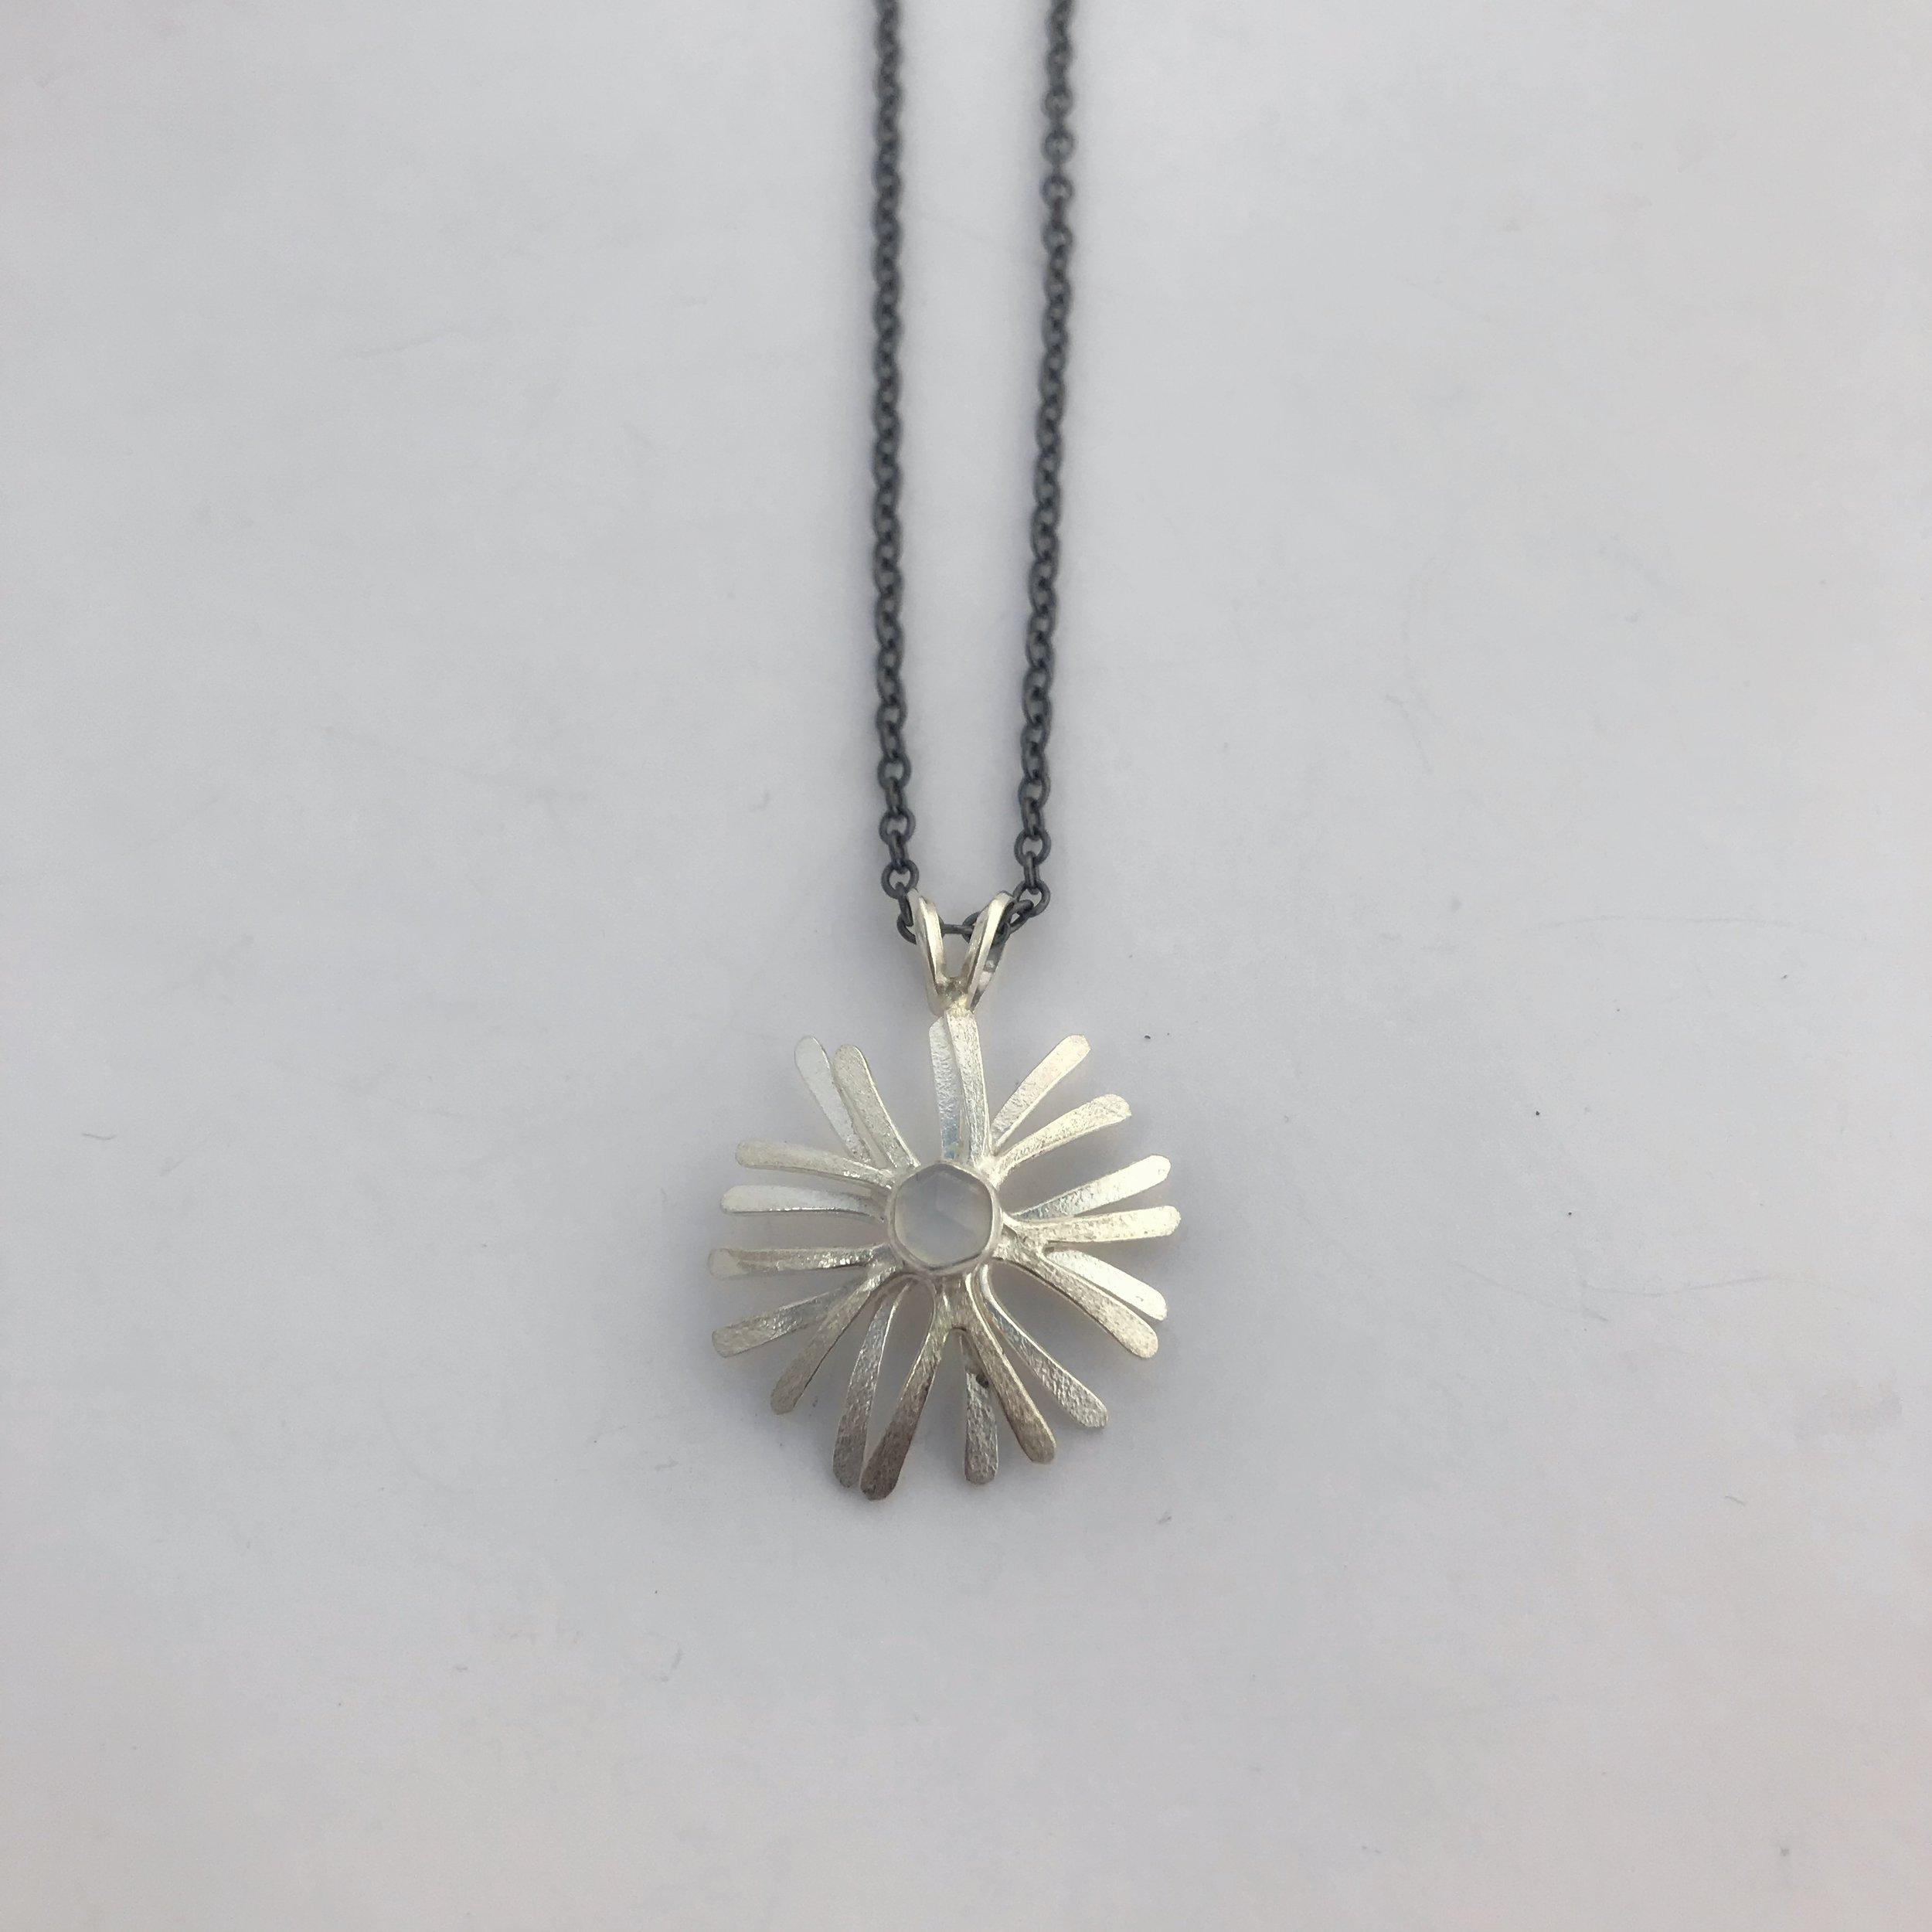 Starburst Pendant, Sterling Silver, Oxidized Chain, Moonstone